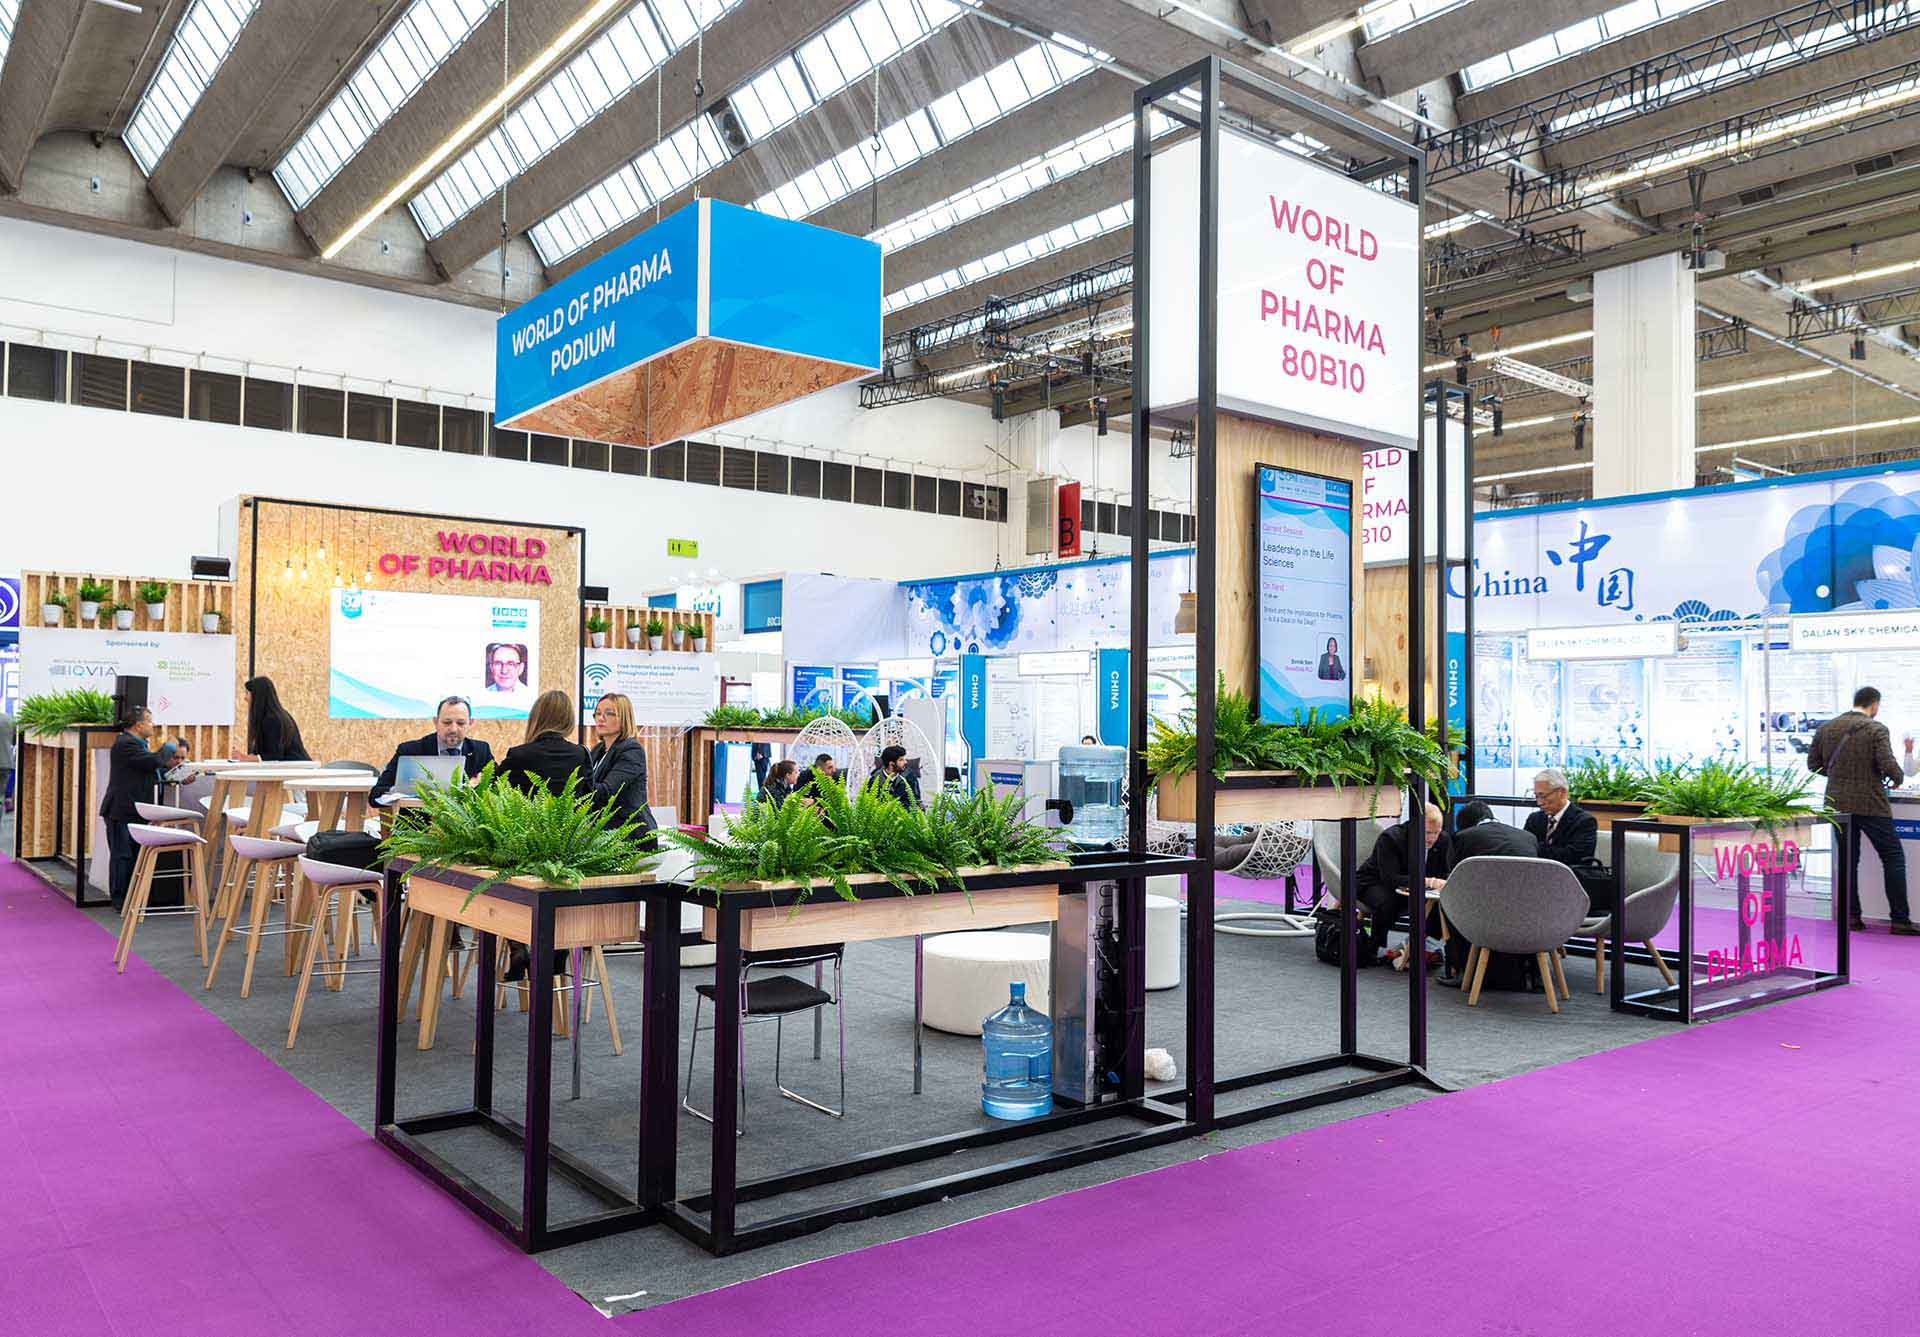 CPHI exhibition common areas design